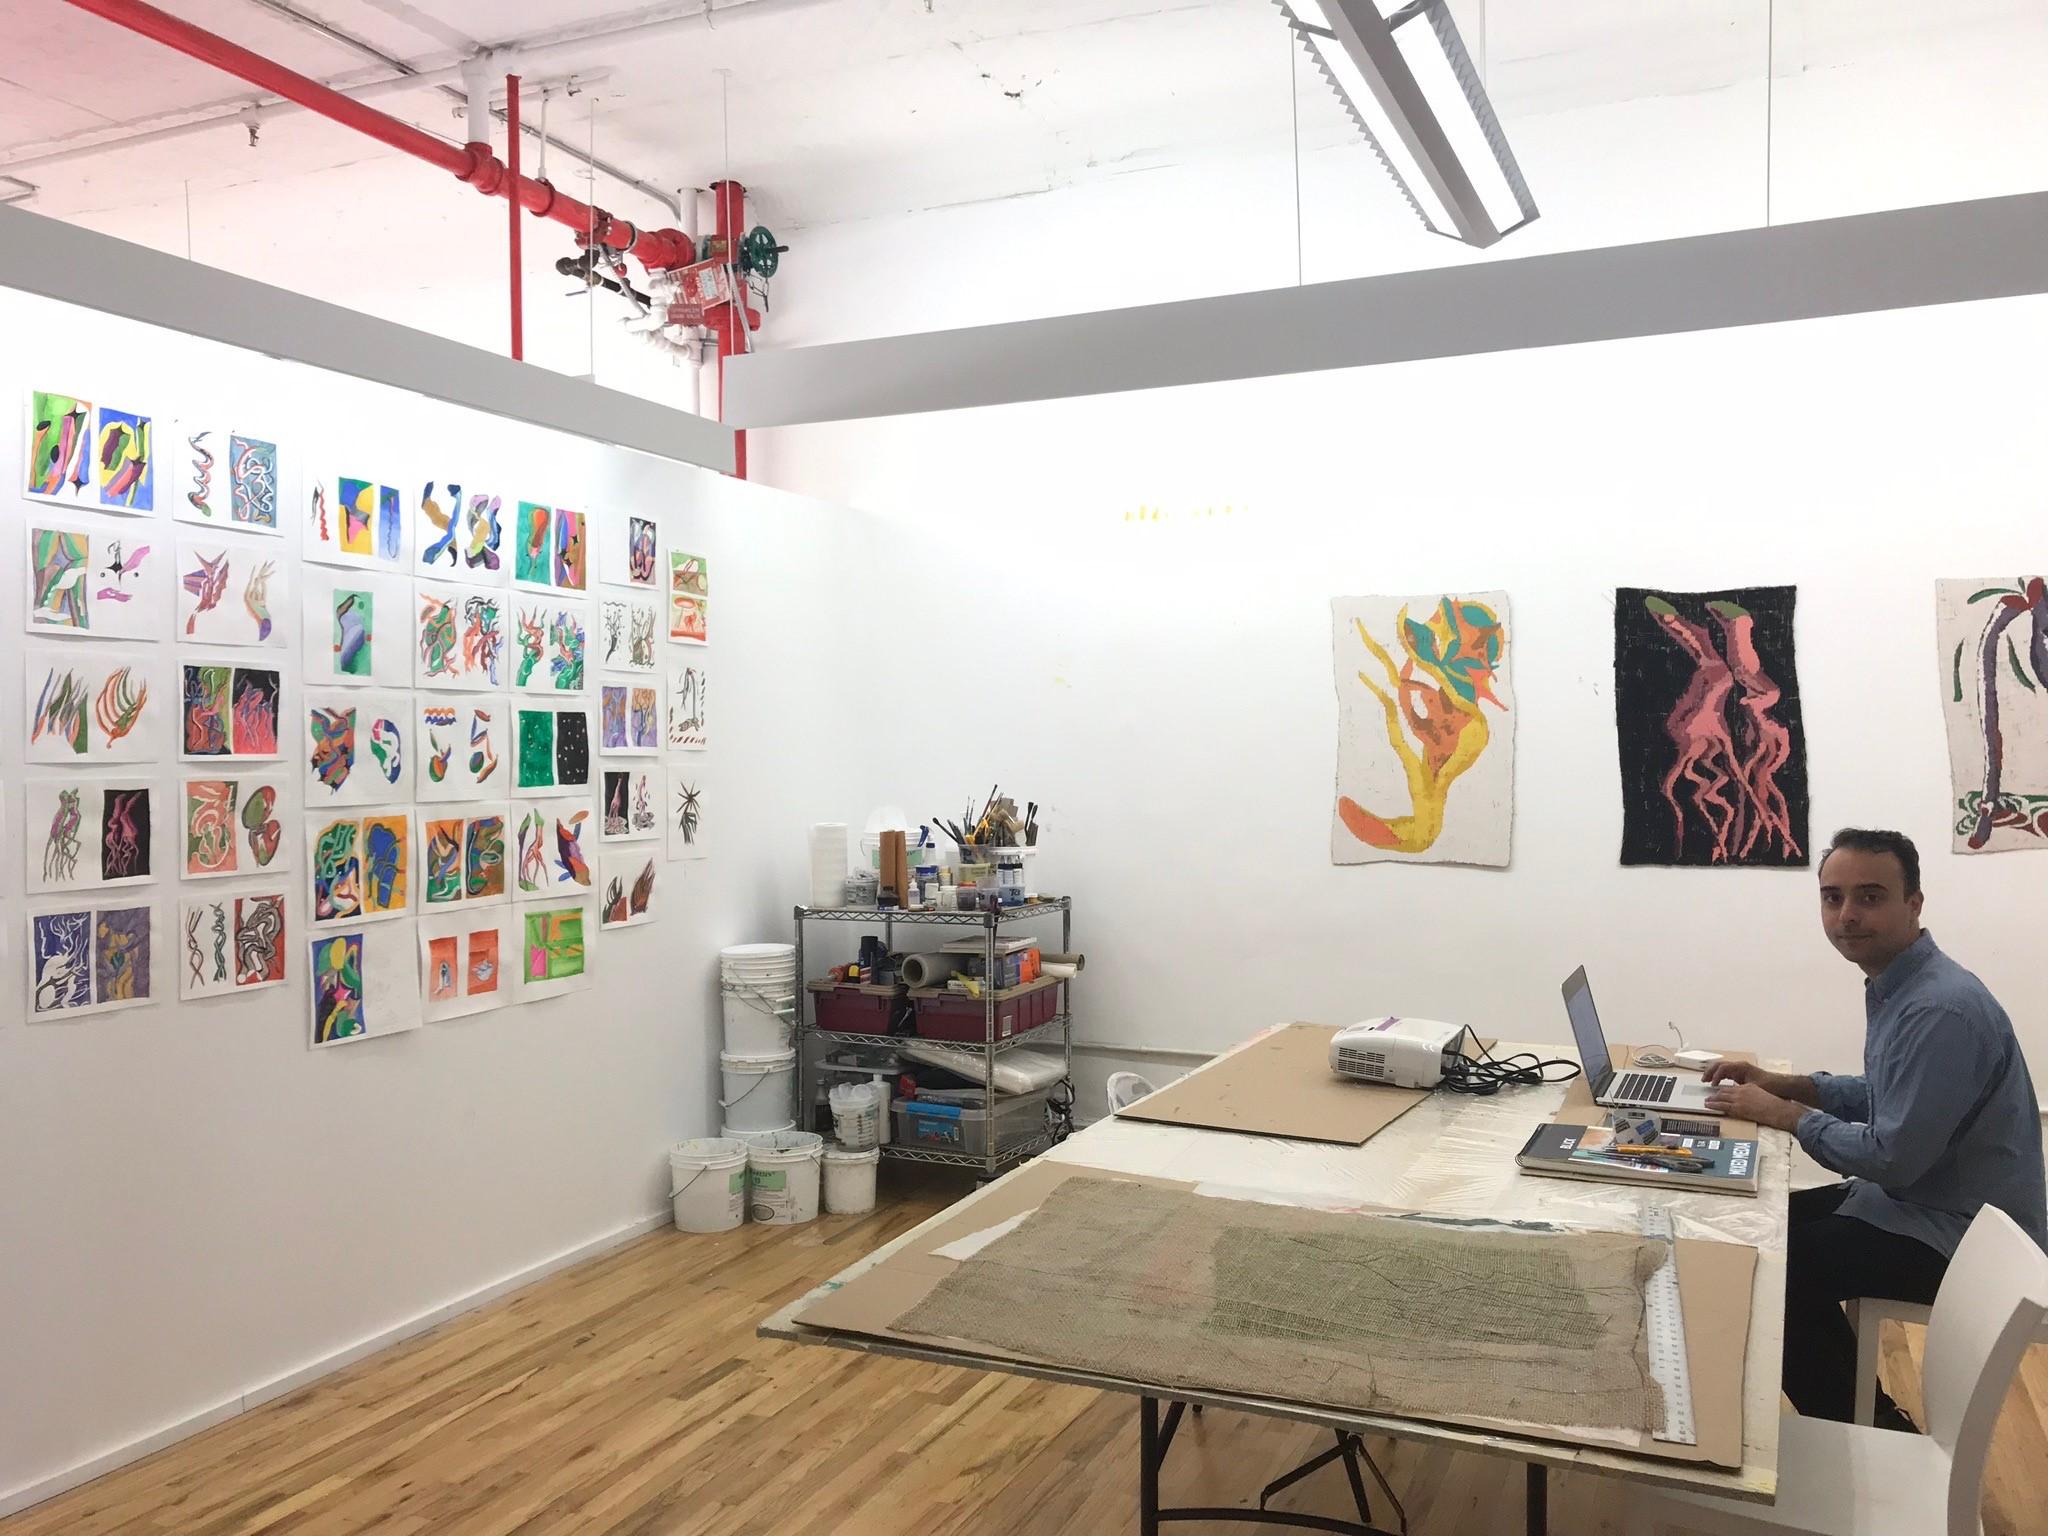 Yasi Alipour, Open Studios 2019